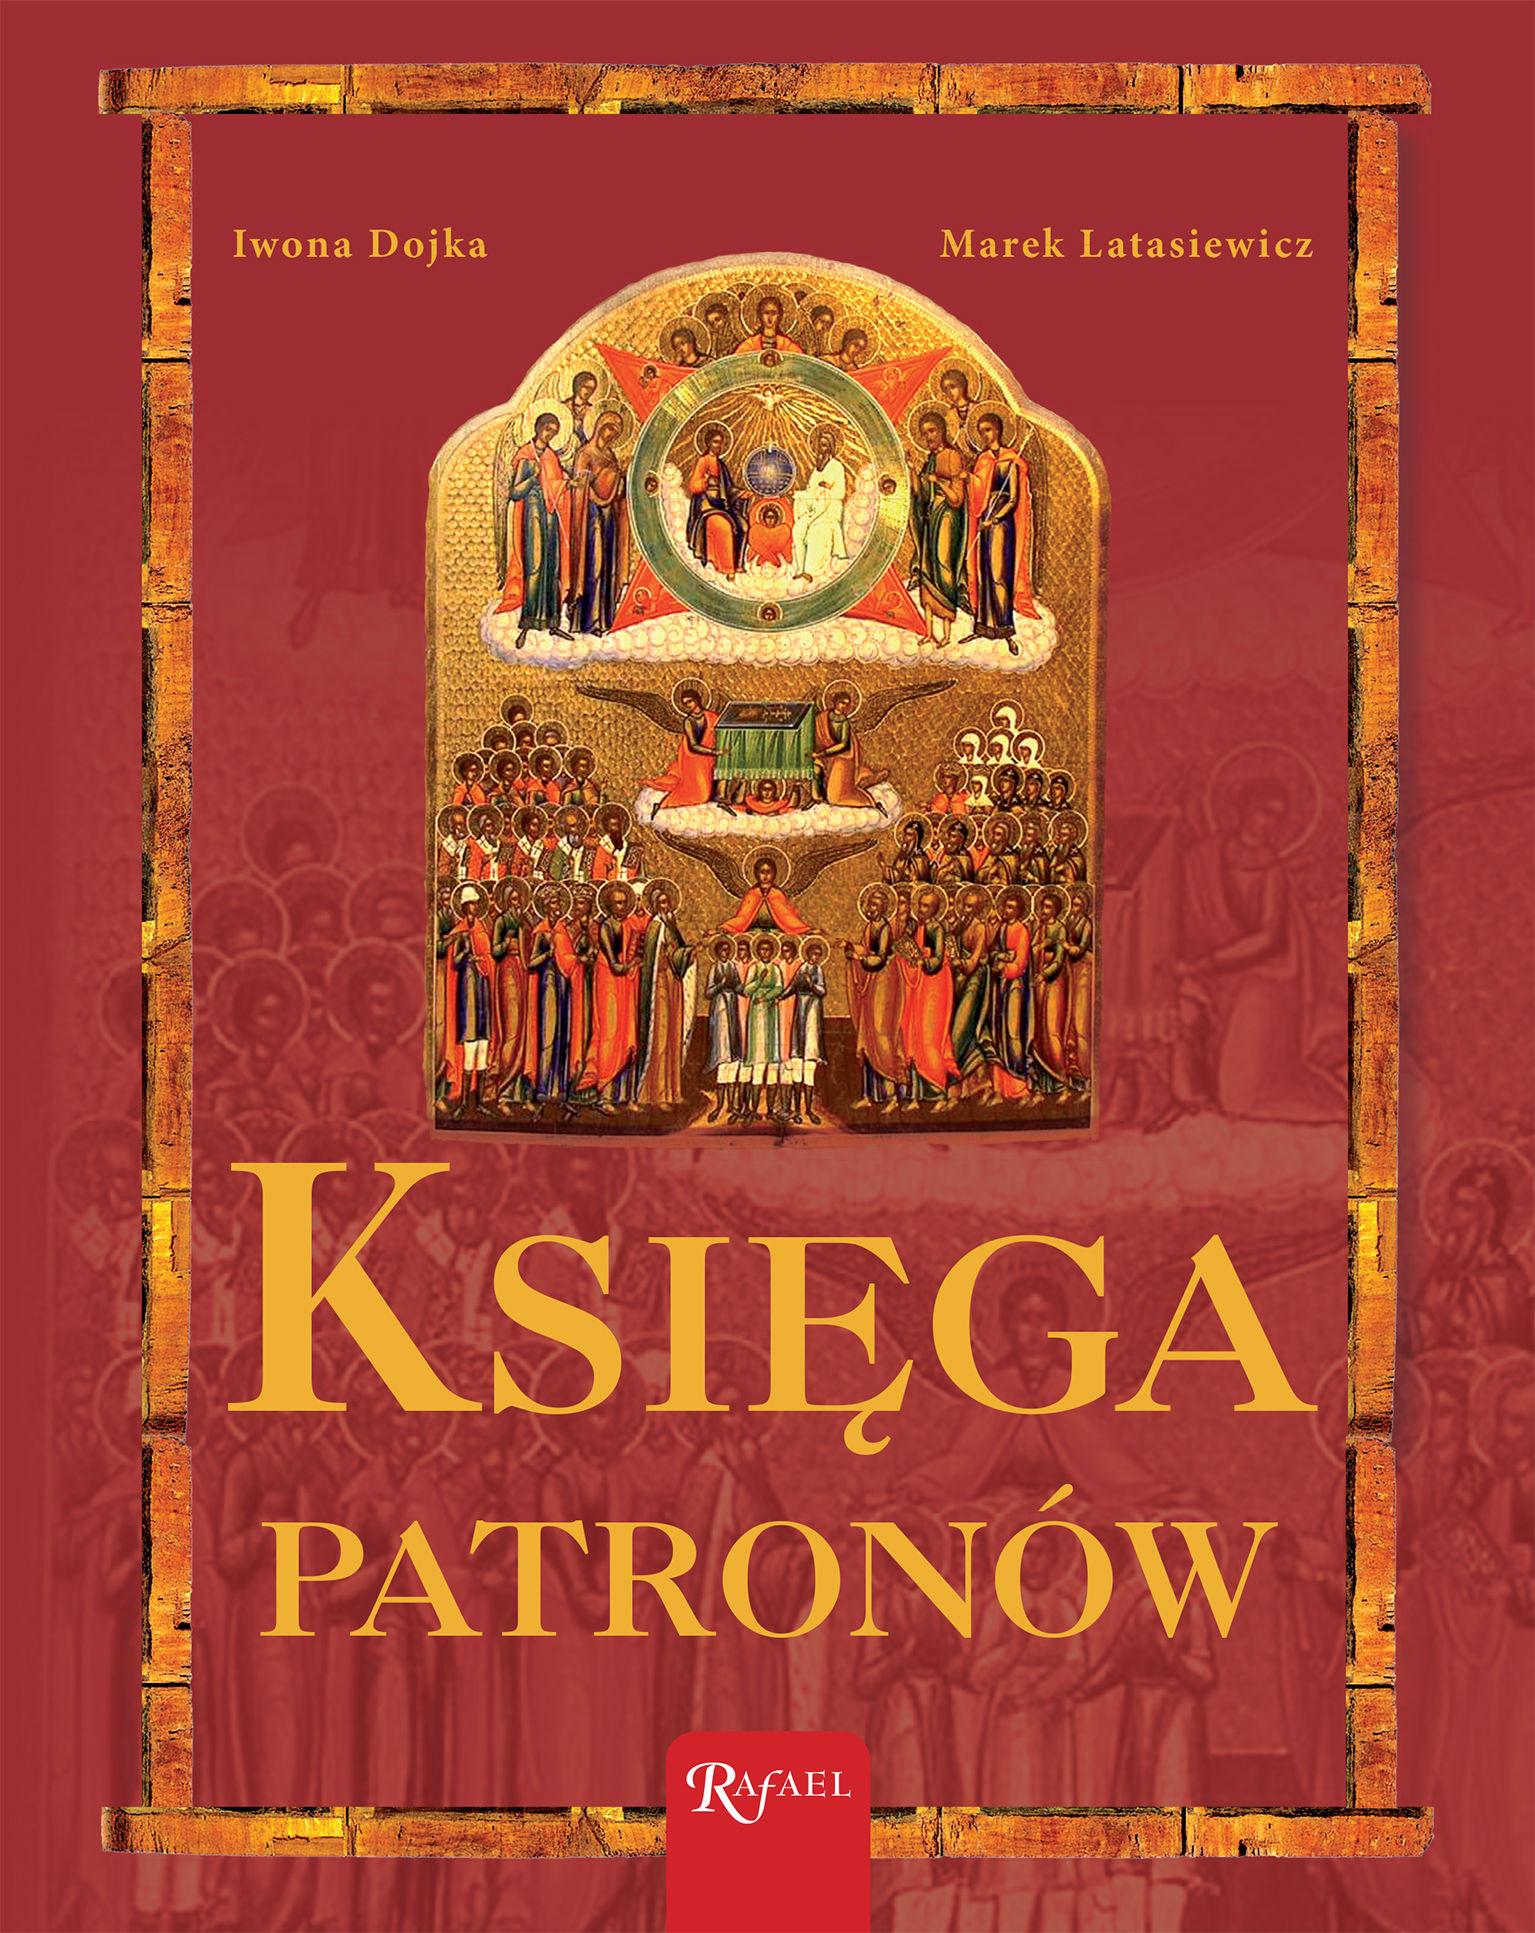 Księga patronów - Iwona Dojka - ebook